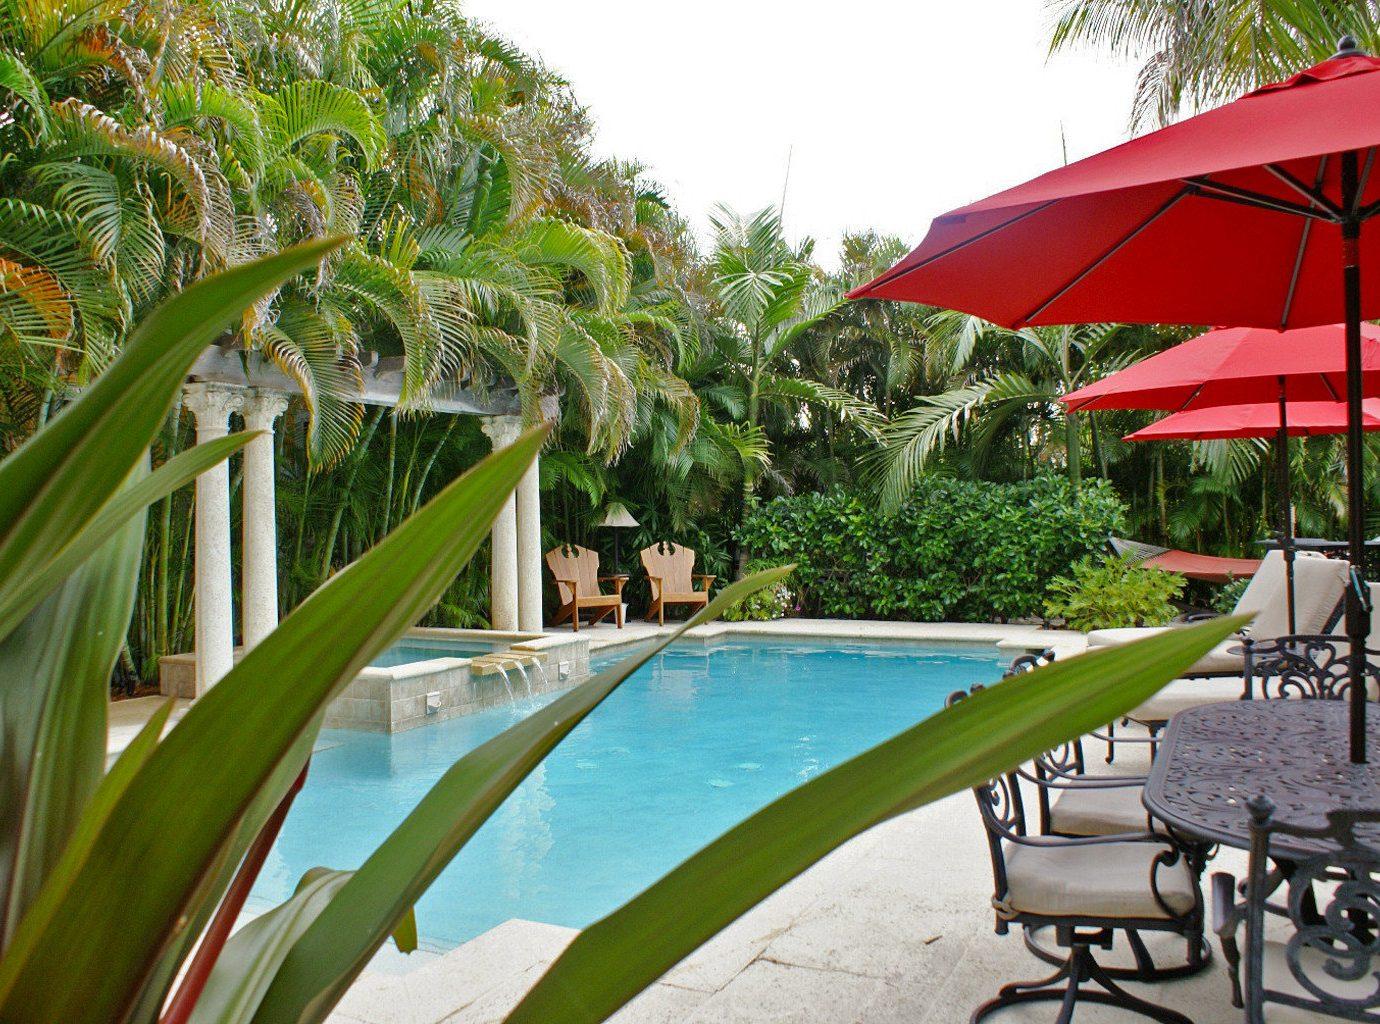 Lounge Luxury Pool tree chair umbrella leisure plant Dining Resort arecales green swimming pool tropics lawn backyard Villa caribbean sunny flower palm shade set accessory